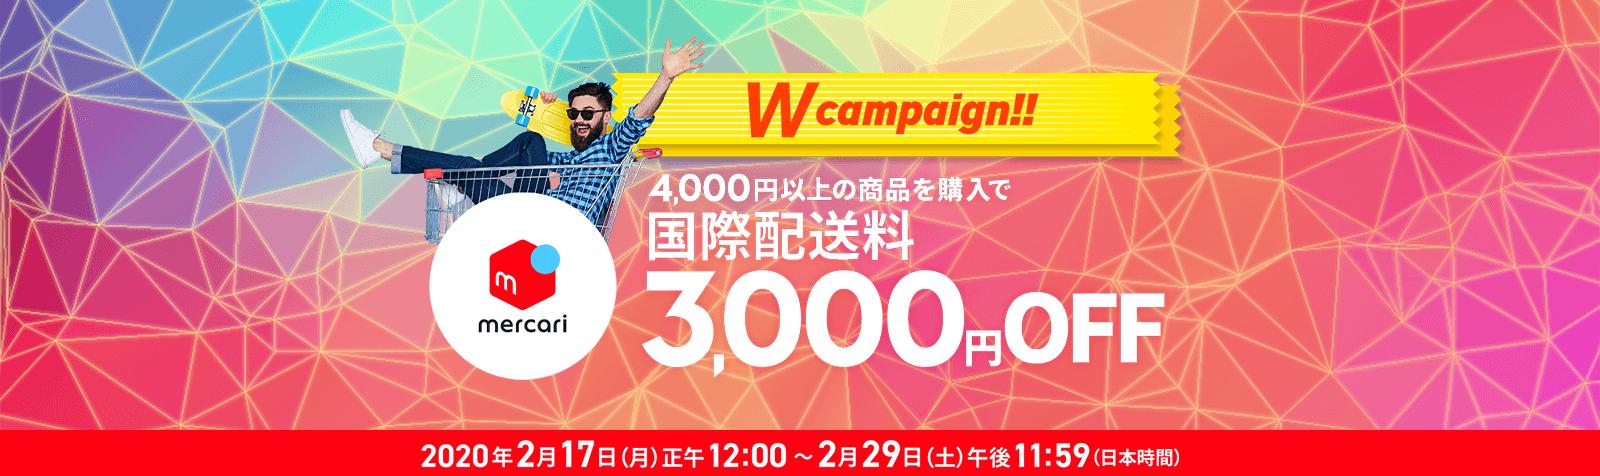 mercari限定国際配送料3,000円OFFキャンペーンを期間限定開催中 - Buyee